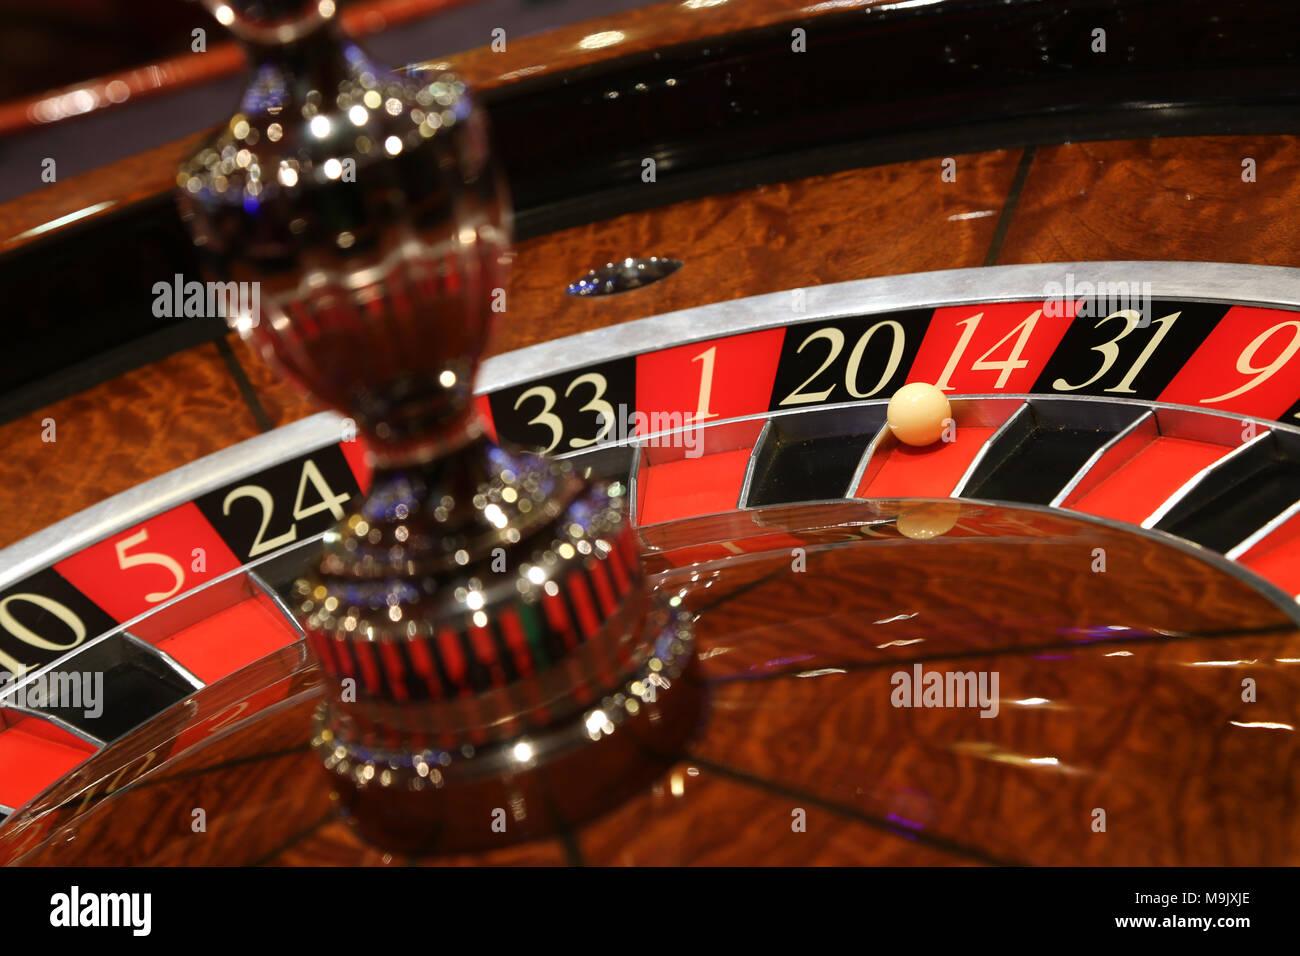 Static roulette in casino. - Stock Image